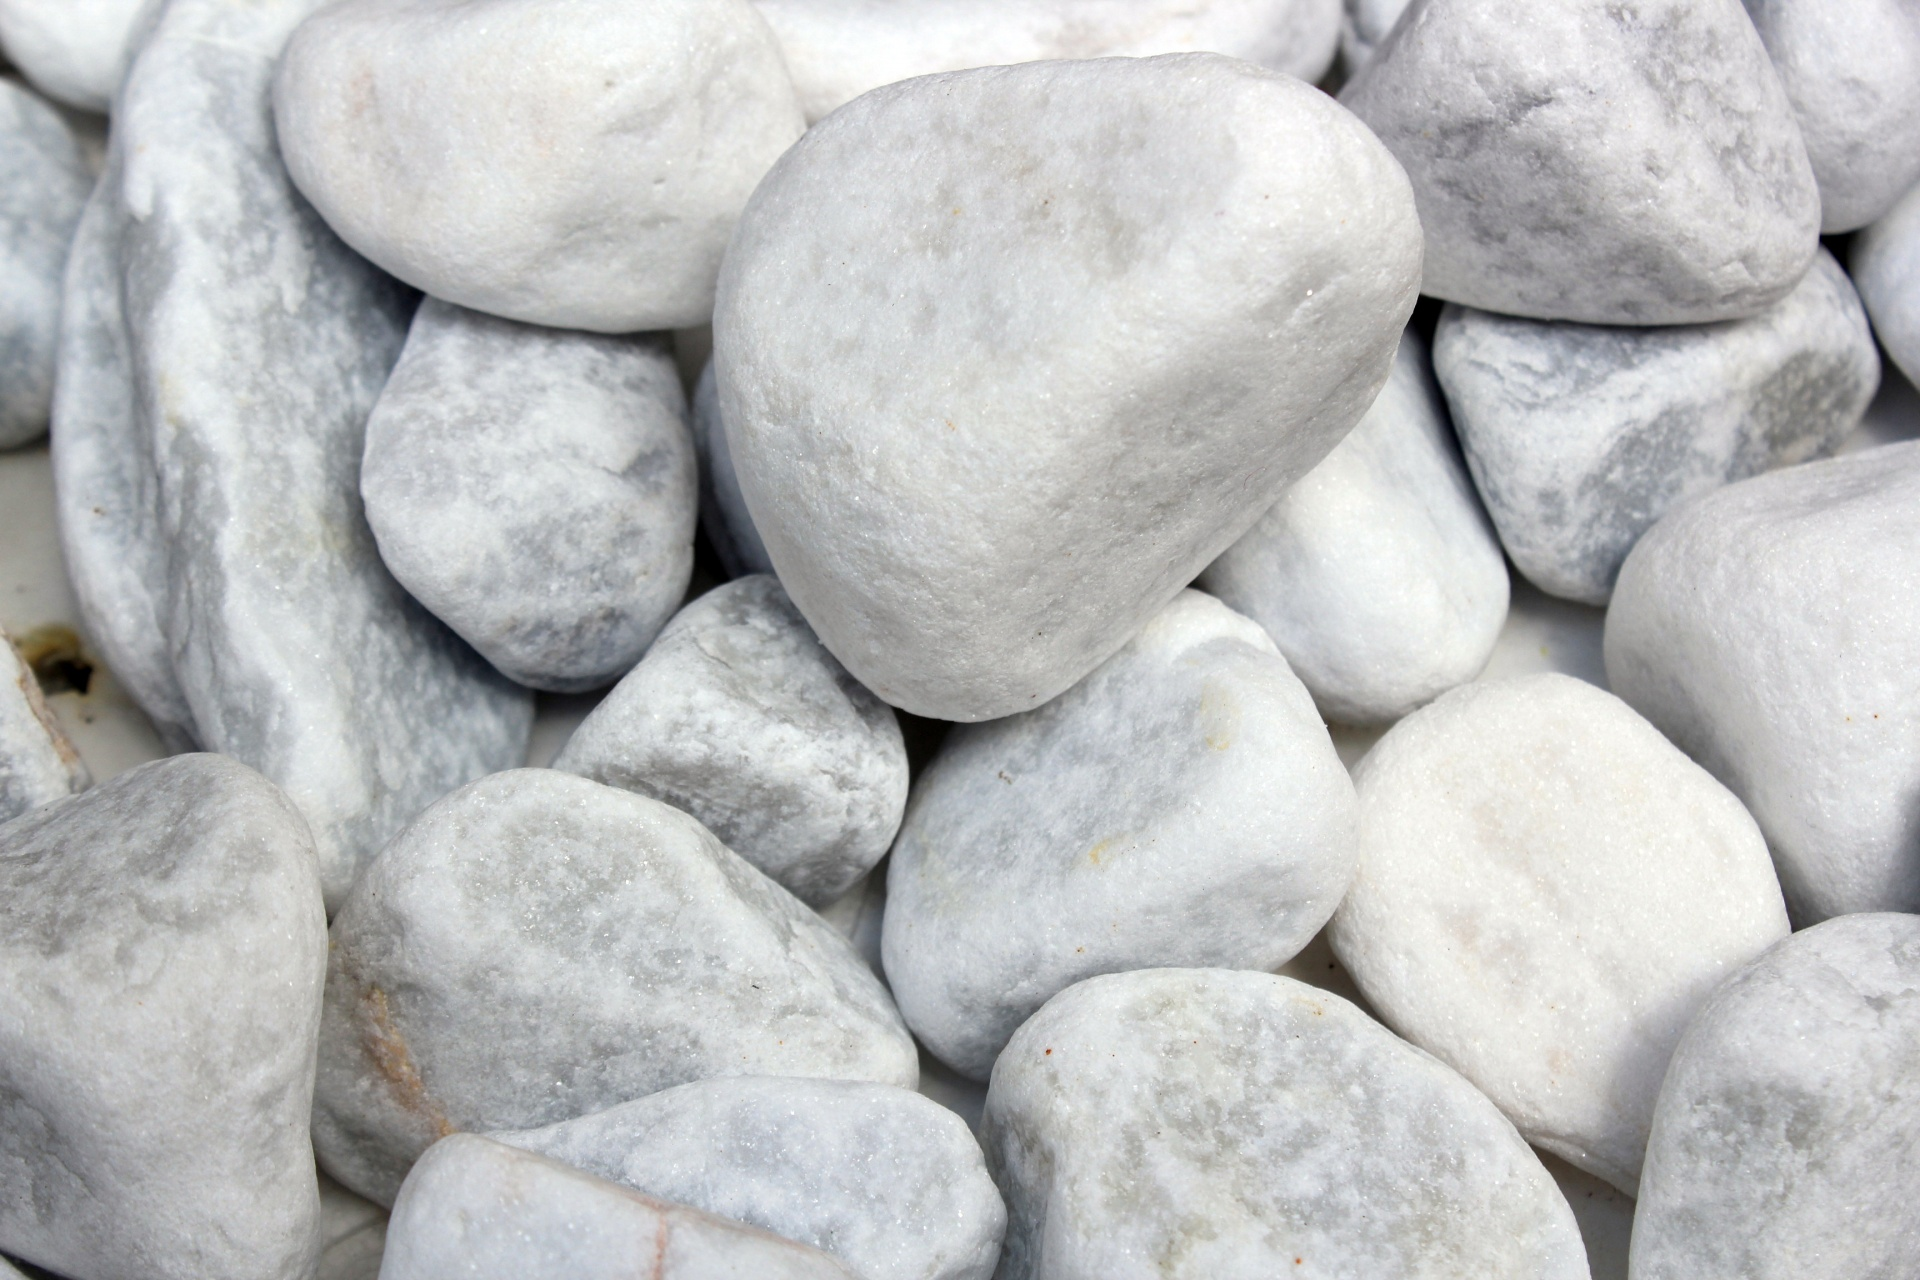 white-rocks-background.jpg